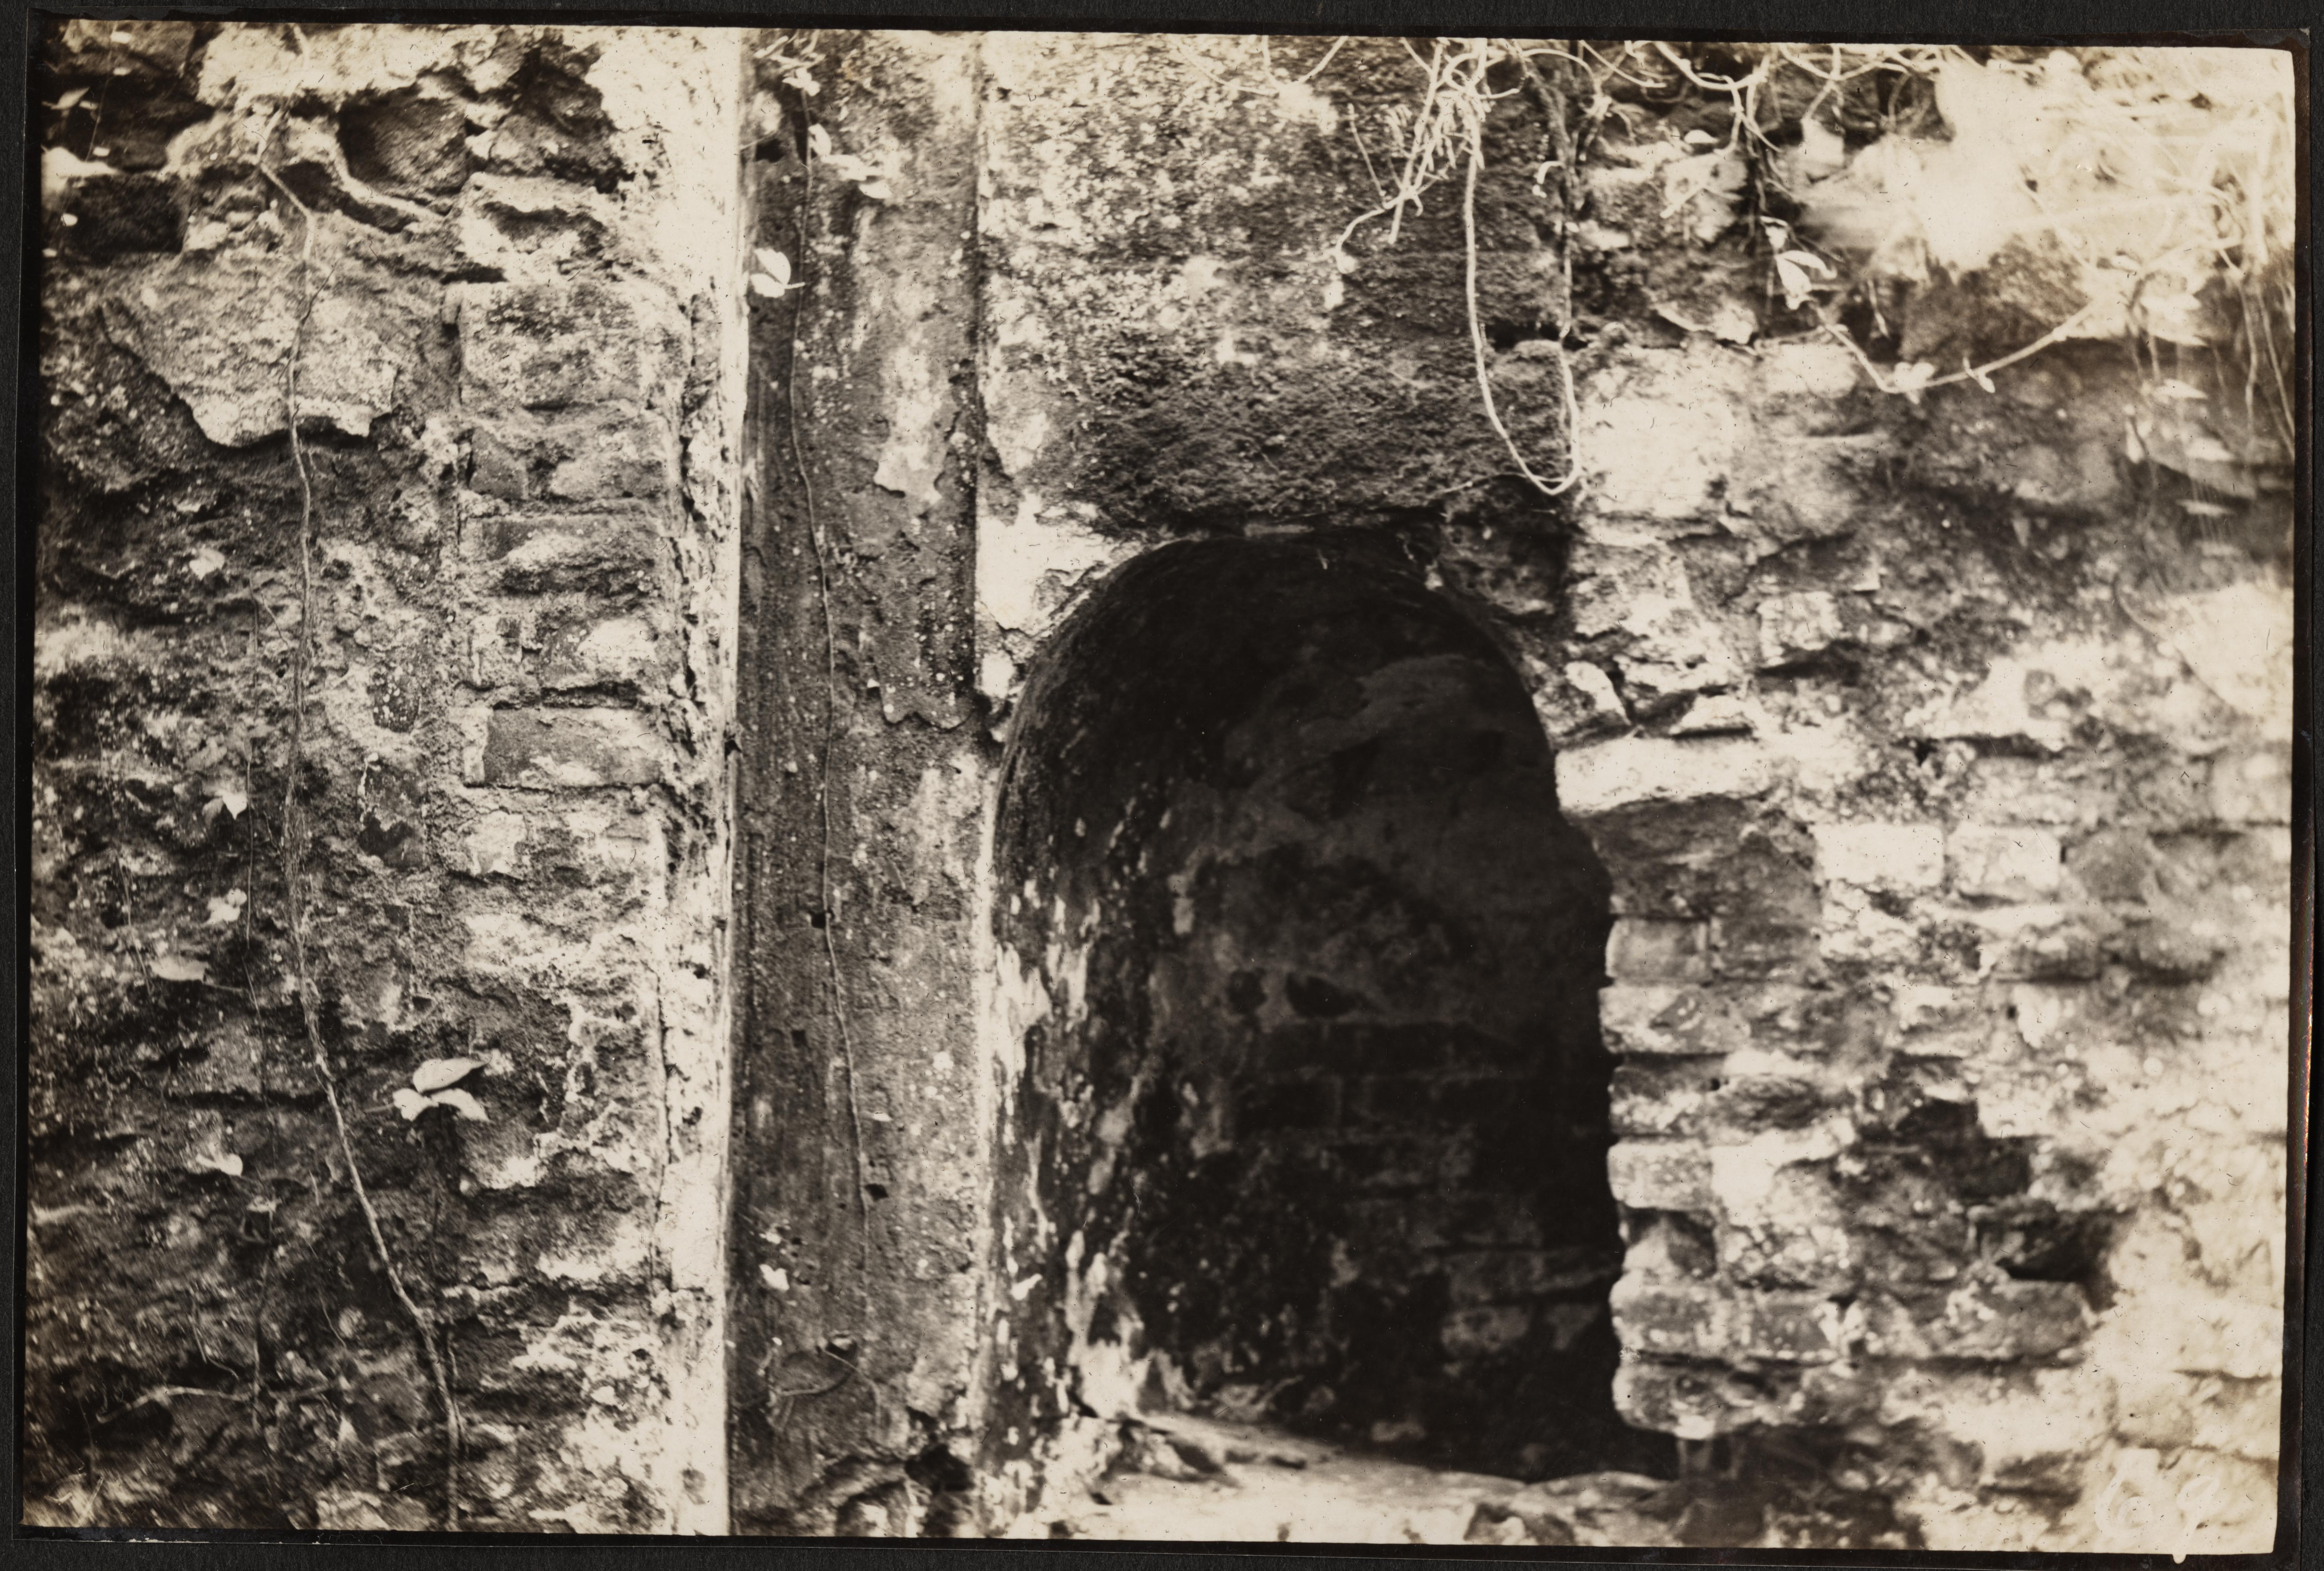 Santee-Cooper Cemetery Investigation 088